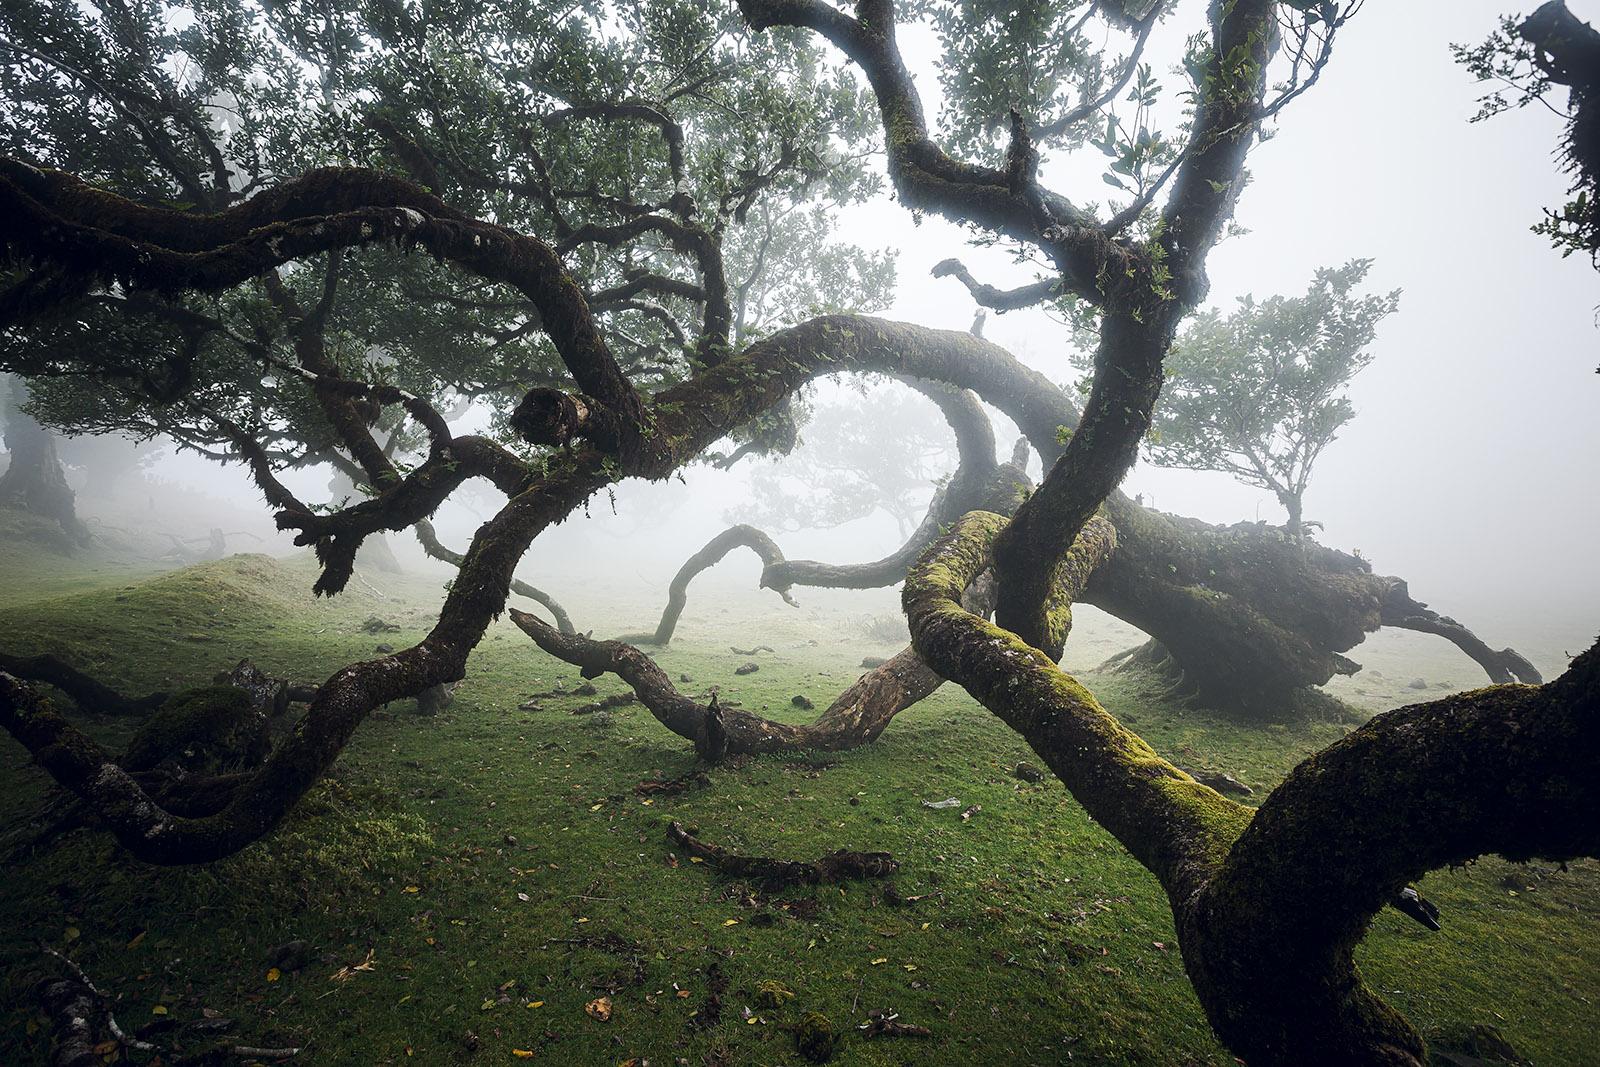 madere-madeira-island-portugal-voyage-travel-elise-julliard-photographe-photographer-serra-do-fanal-foret-primaire-laurifere-lauriers-laurisilva-forest-brouillard-fog